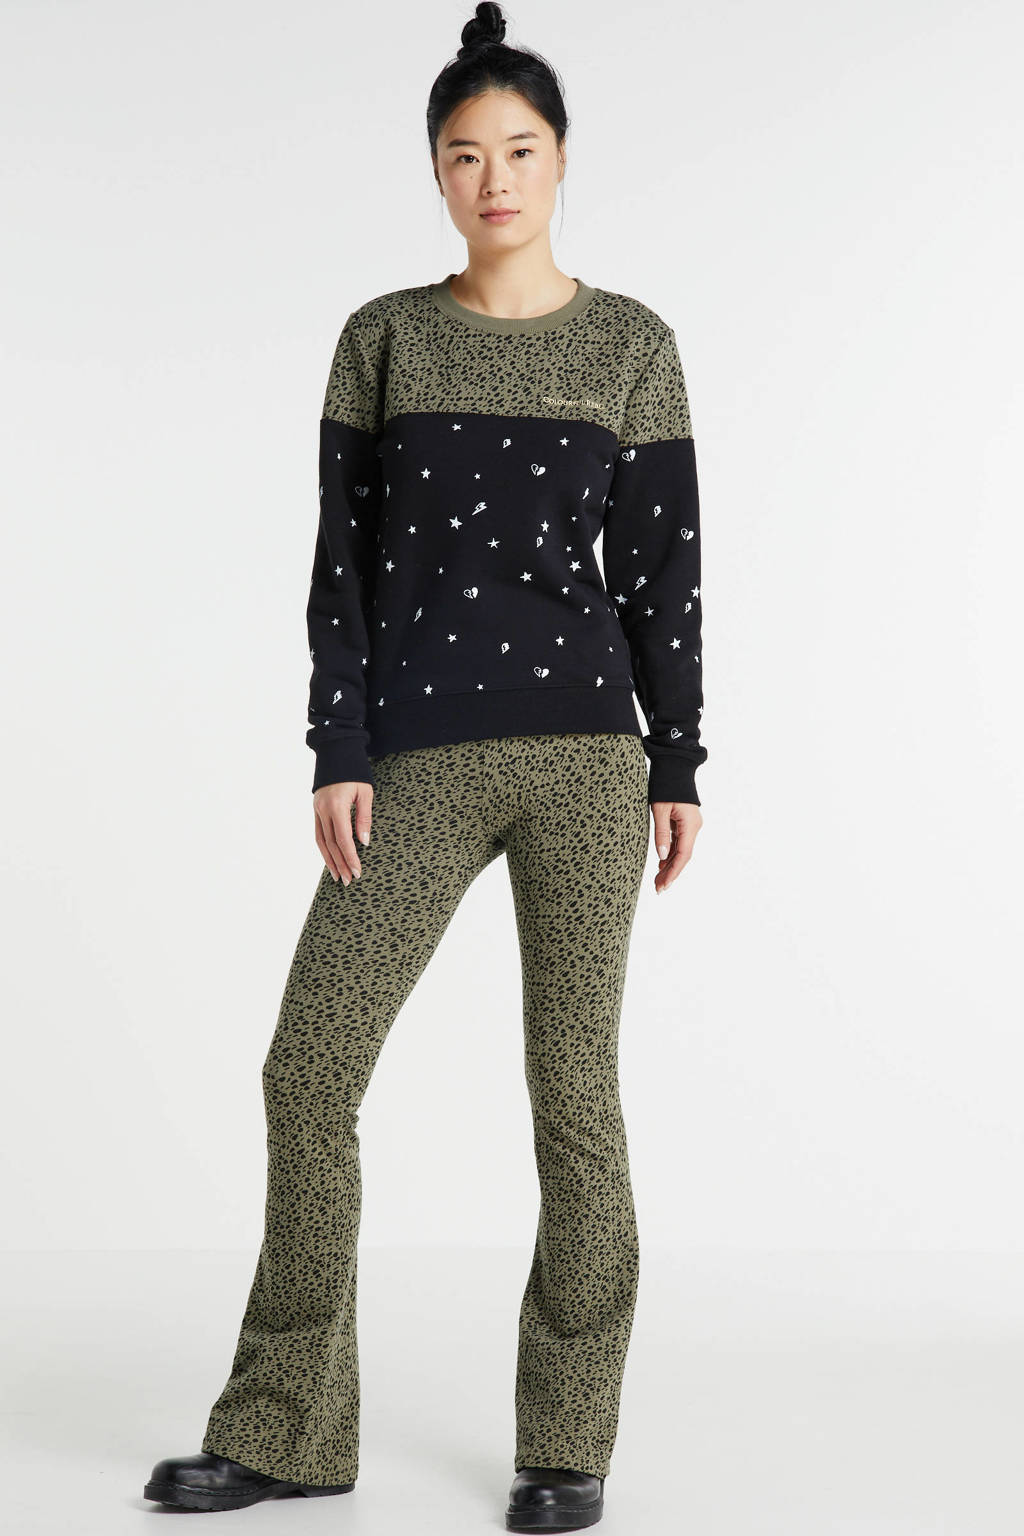 Colourful Rebel flared broek Leopard Dot met dierenprint kaki, Kaki